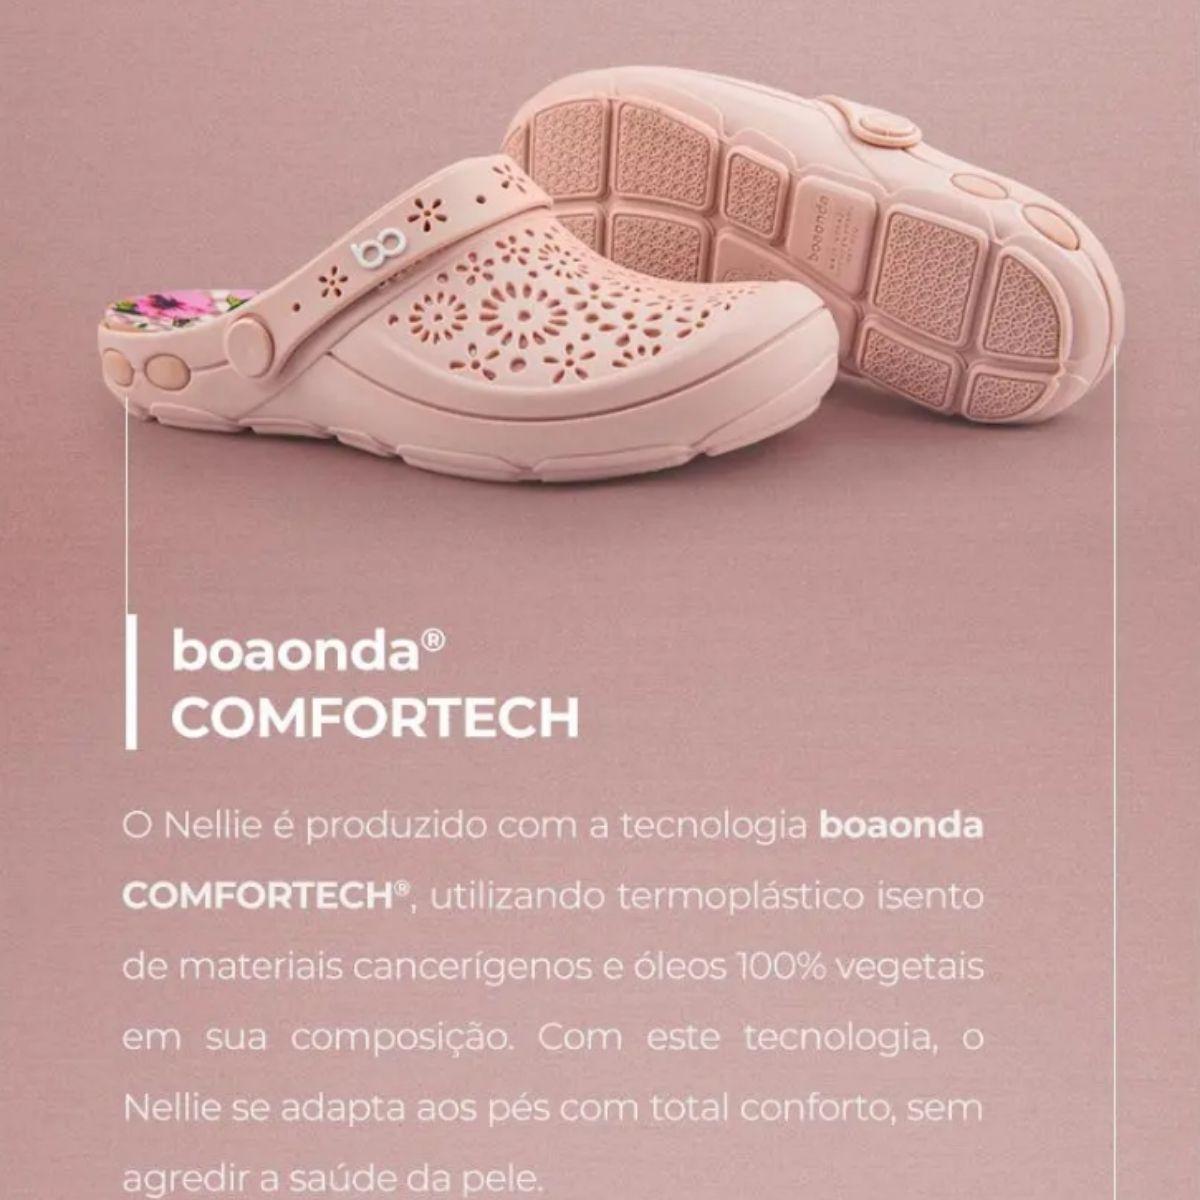 Sandalia Crocs Boaonda 1317-123 NELLIE